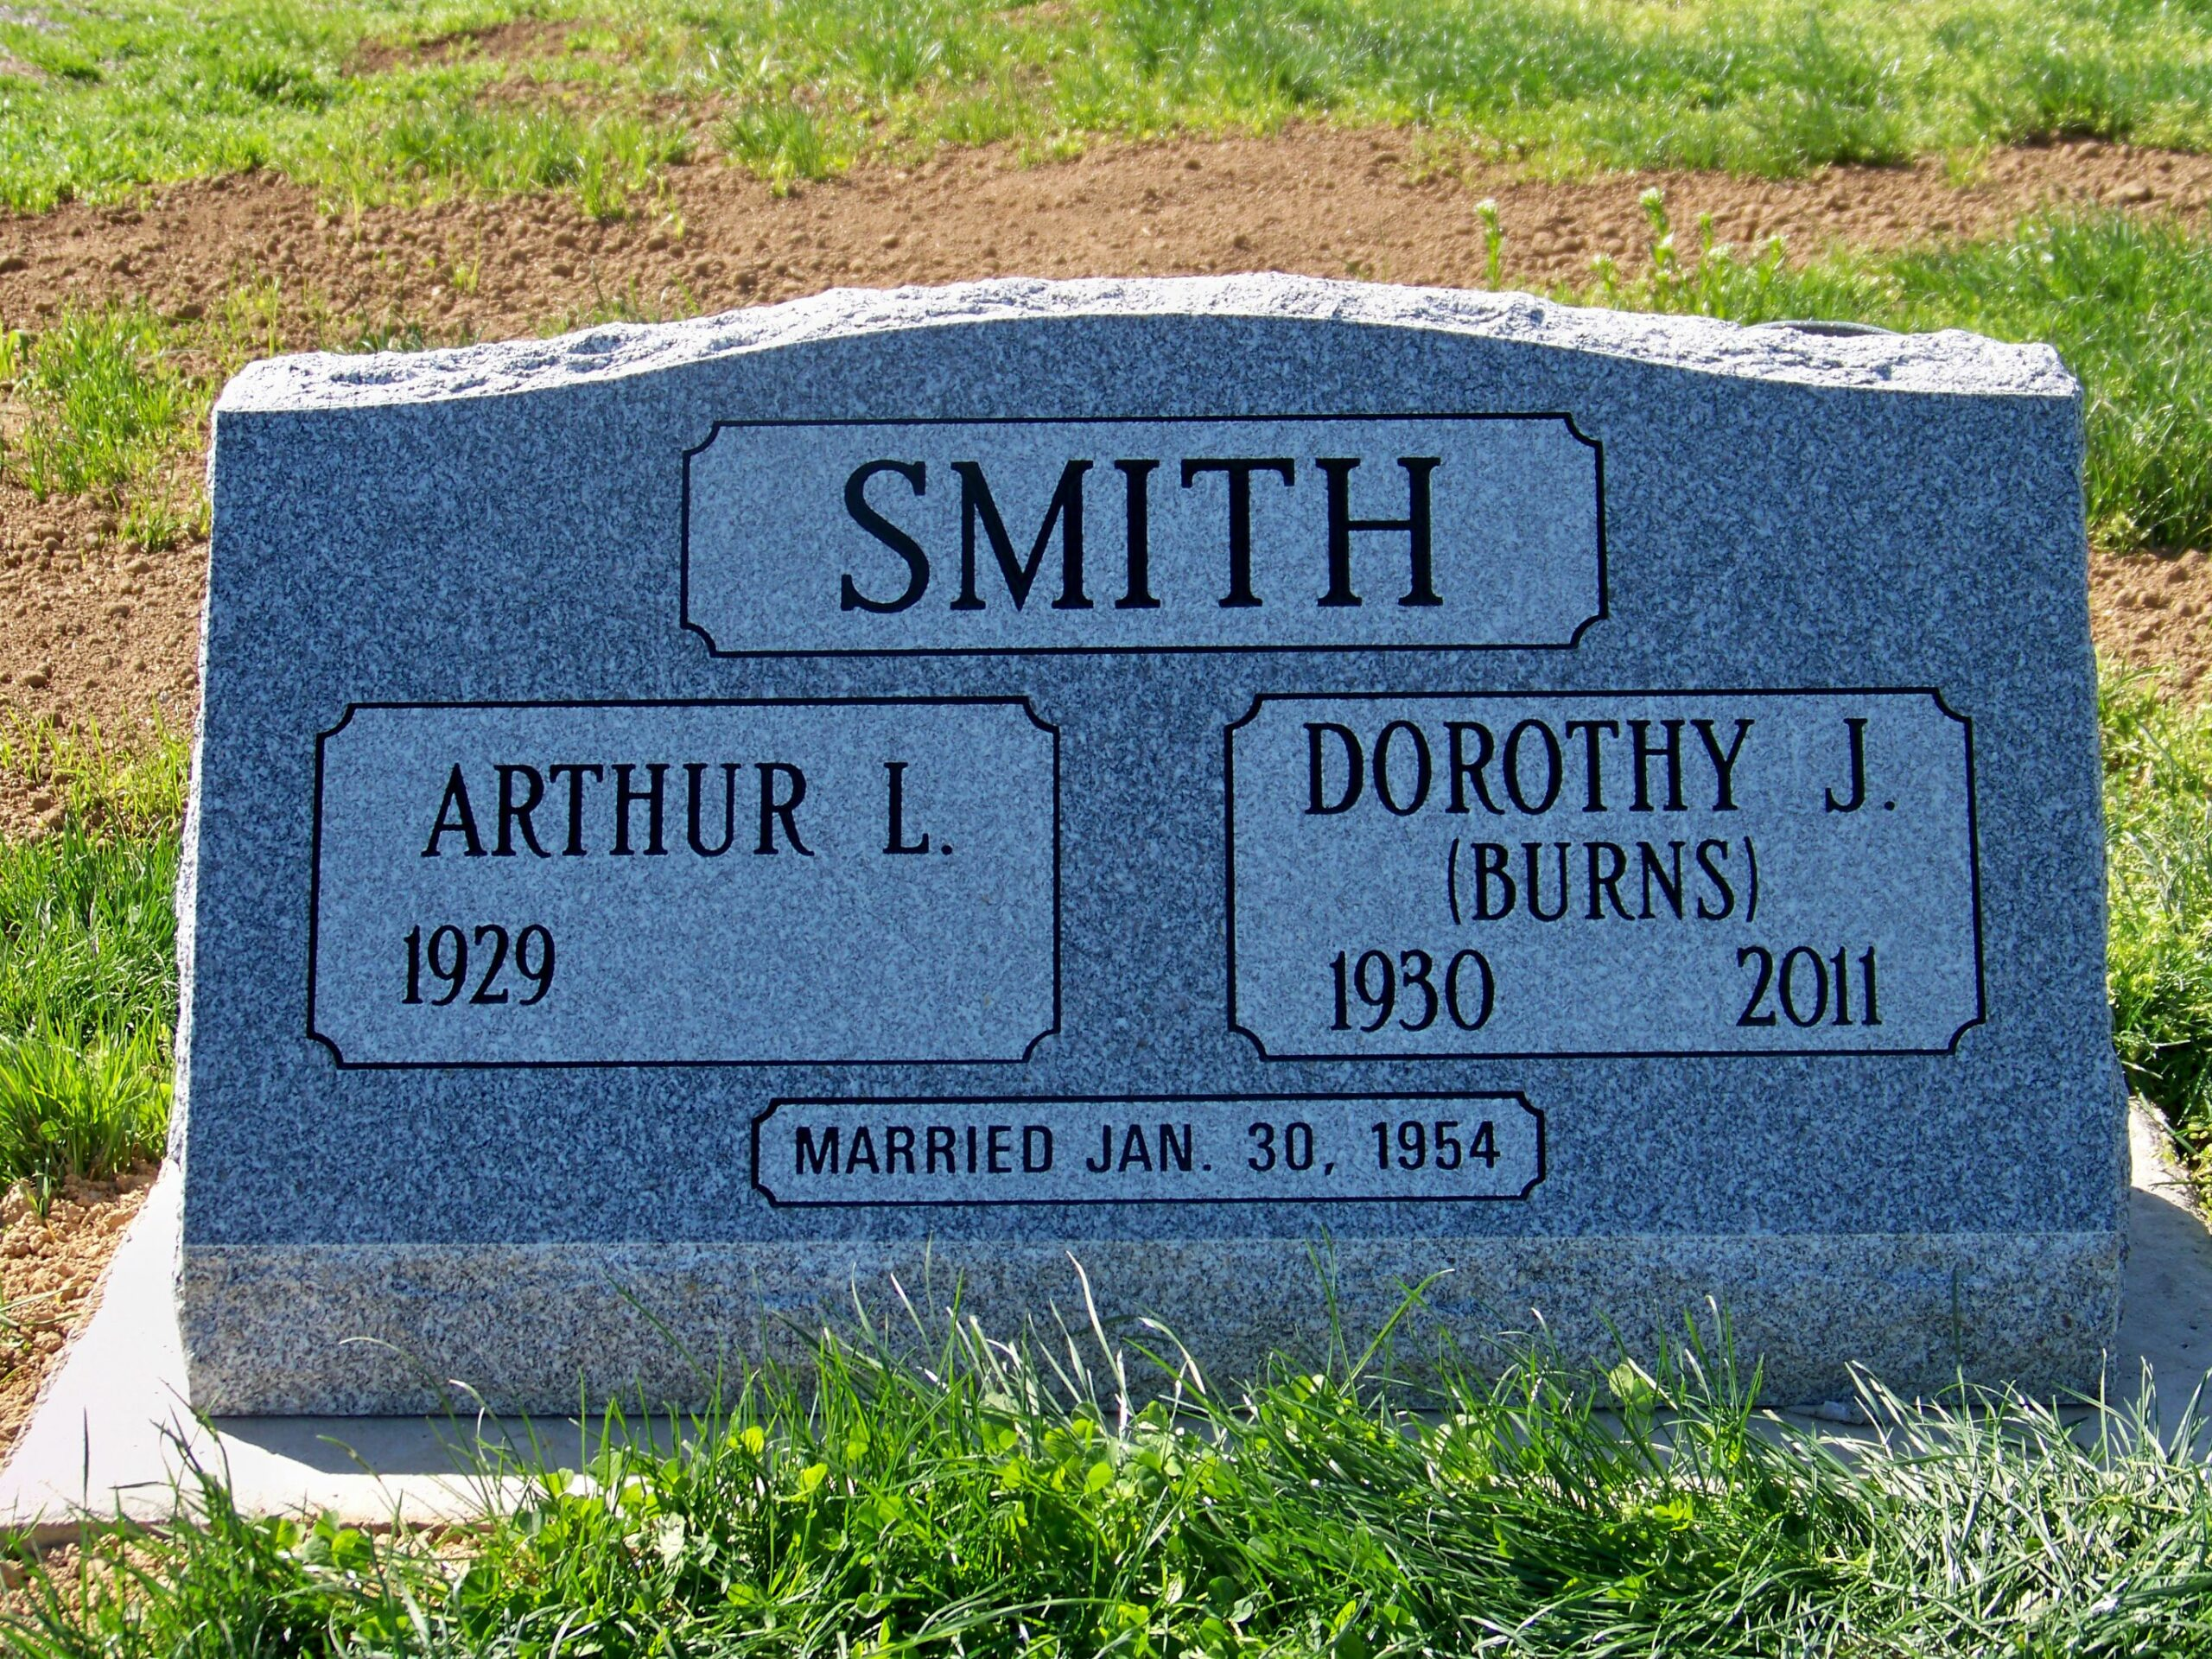 Smith, Arthur L.